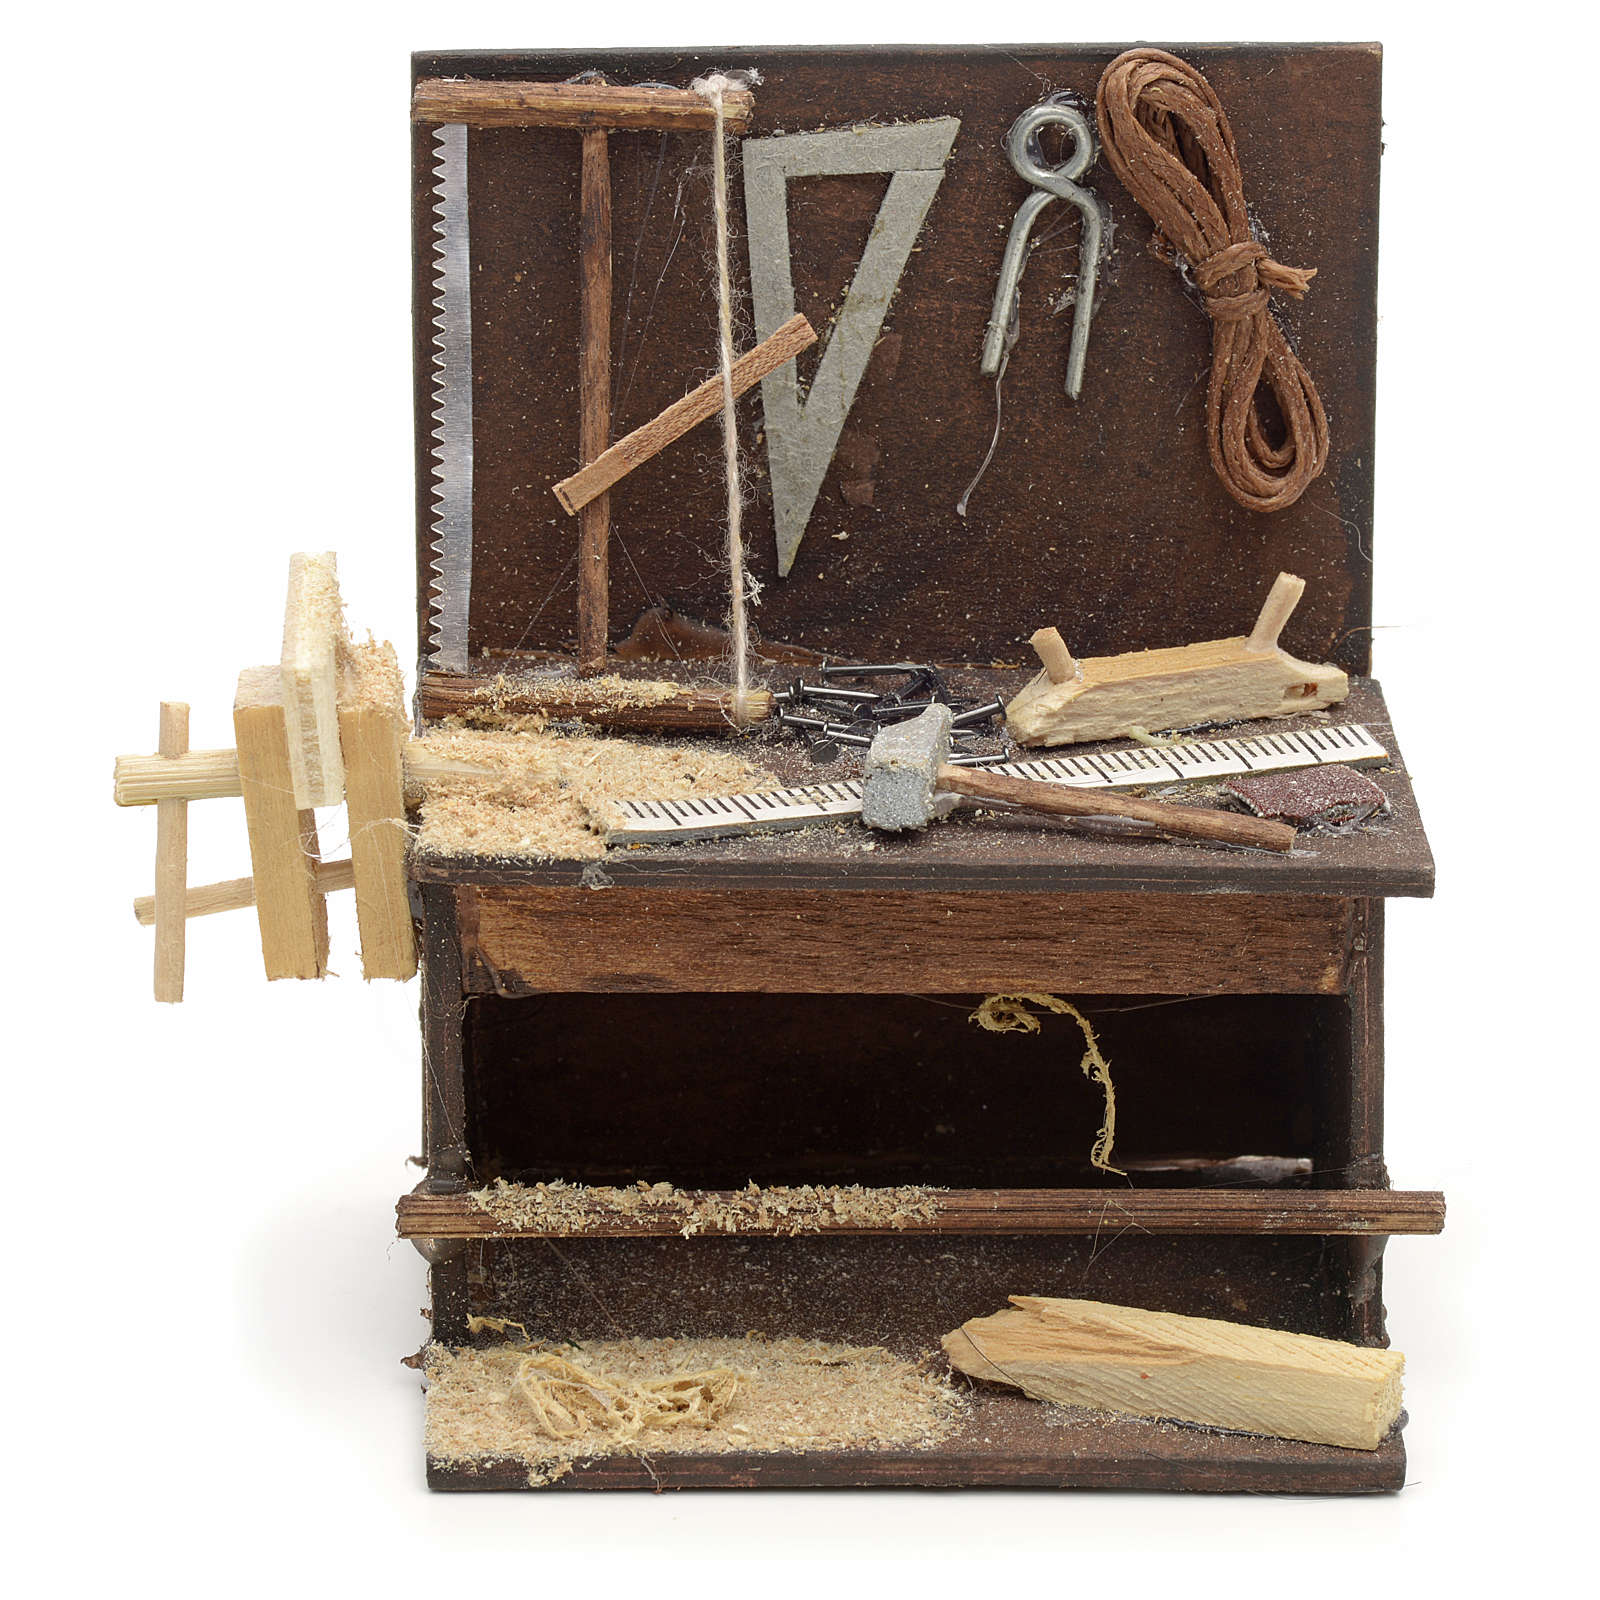 Banco del carpintero pesebre de Nápoles 8,5x6,5x6 cm 4